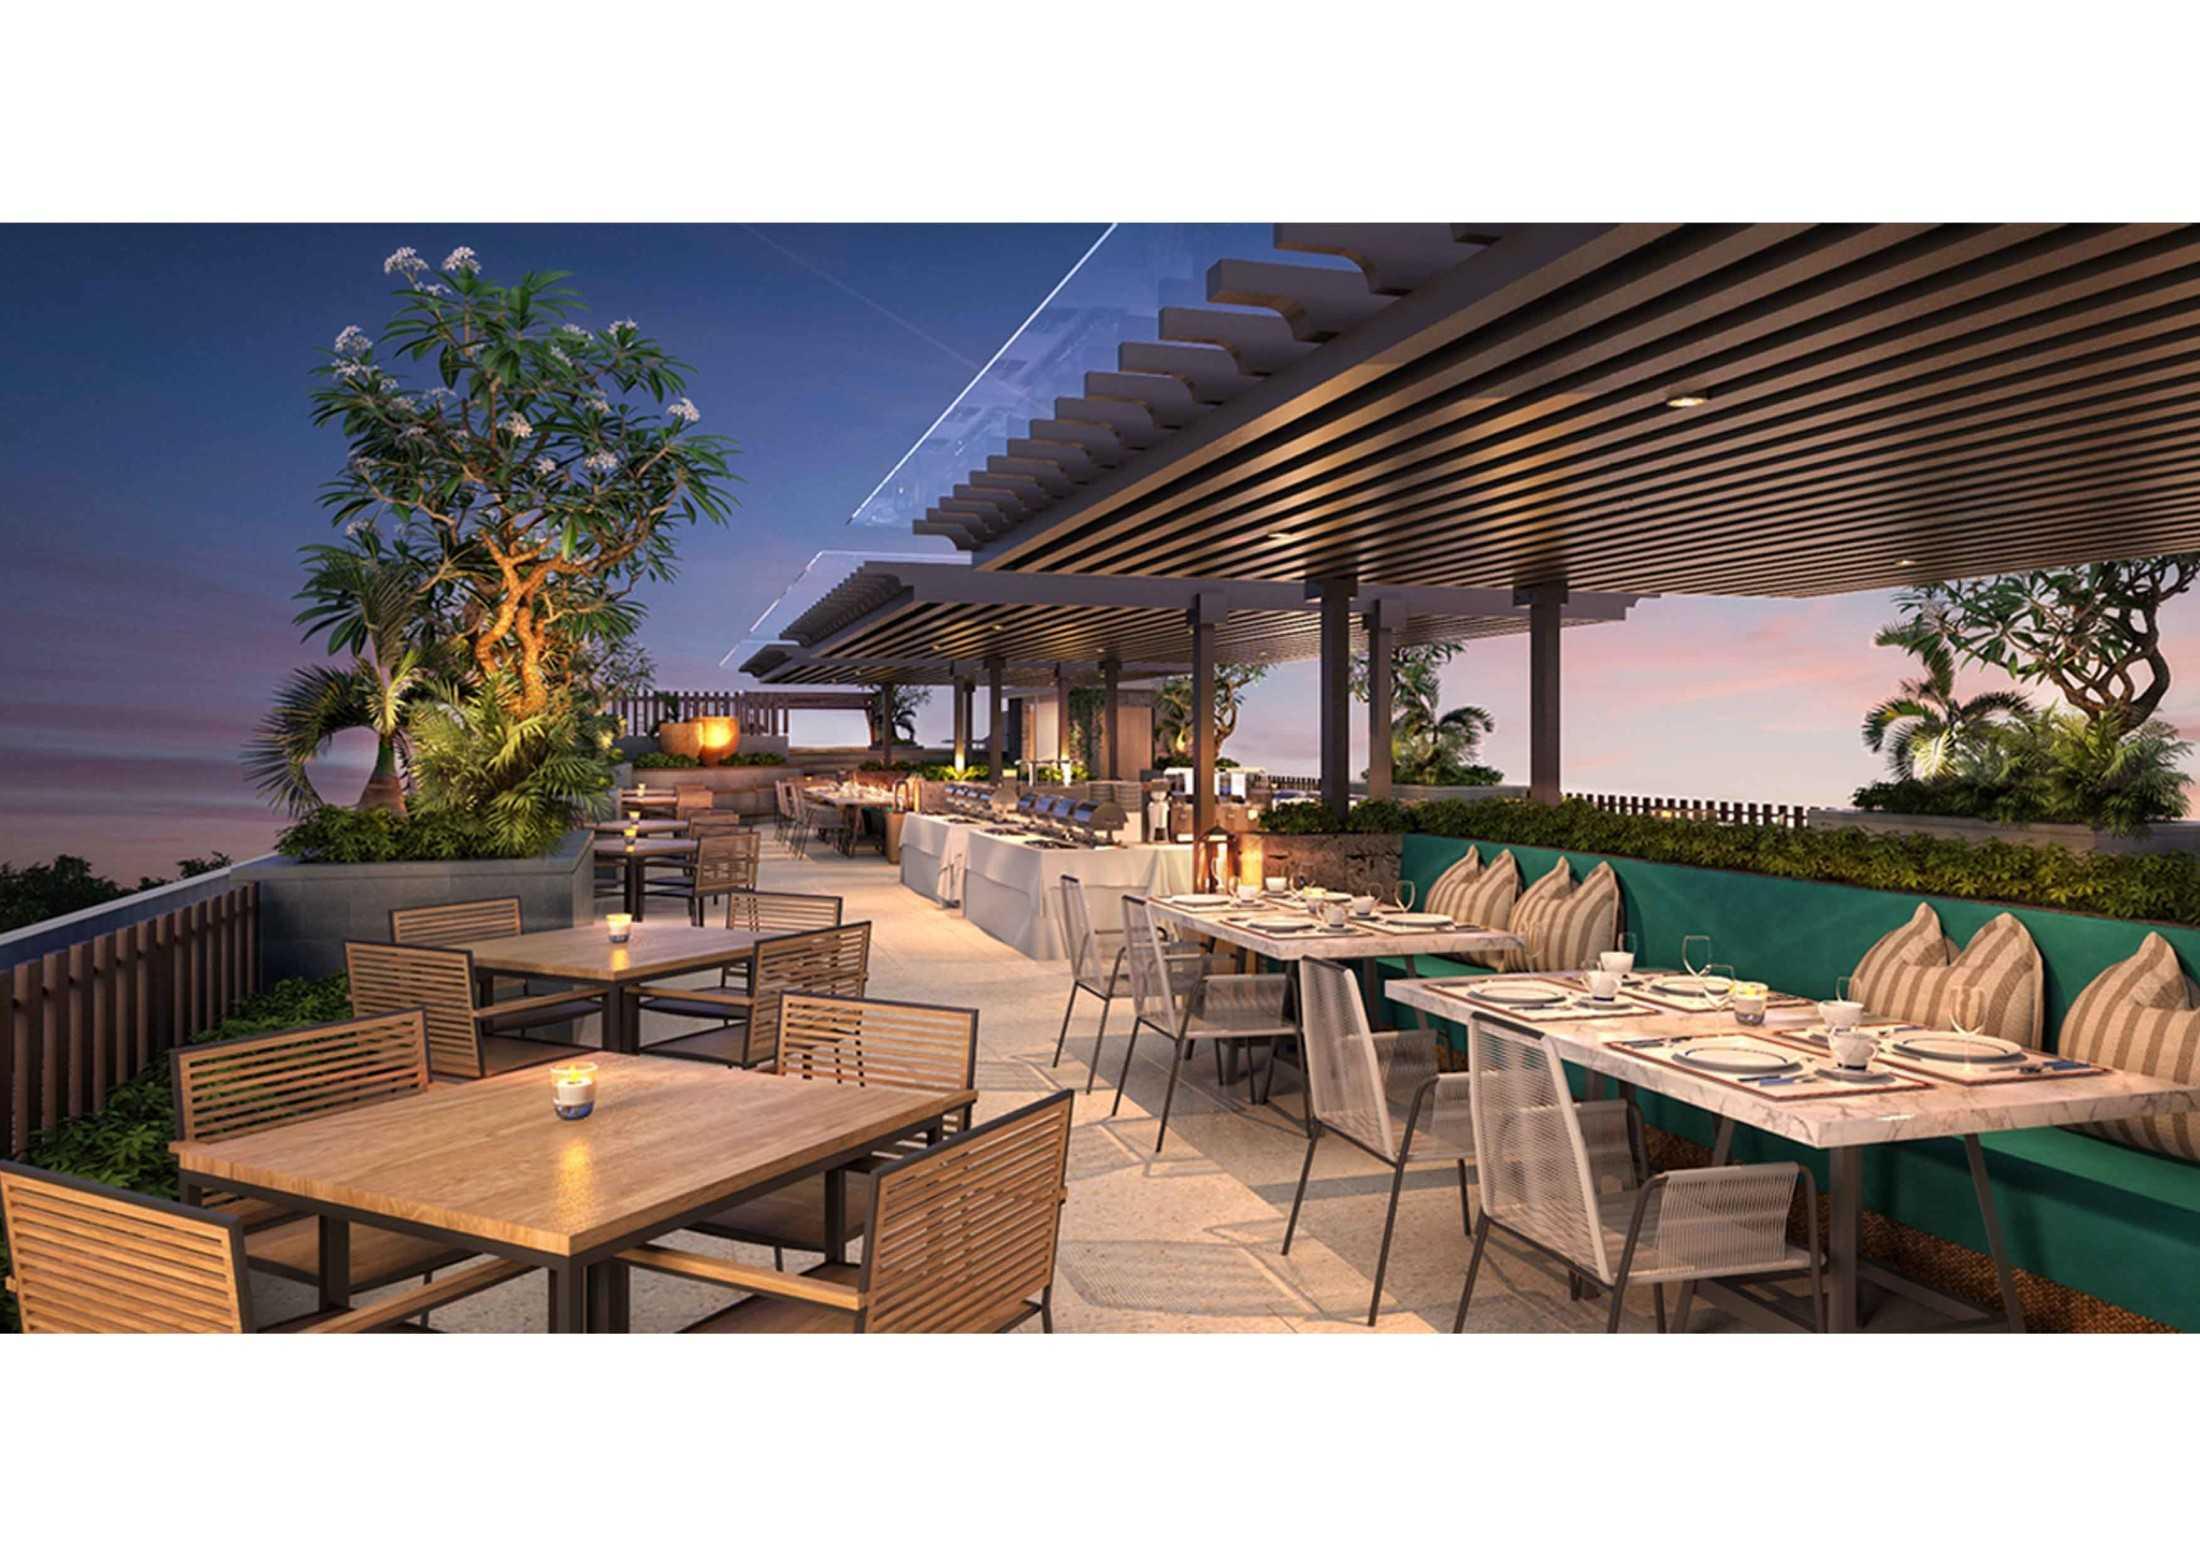 Revan Teggar The Nest Hotel Nusa Dua - Bali Nusa Dua - Bali Revan-Teggar-The-Nest-Hotel  107368